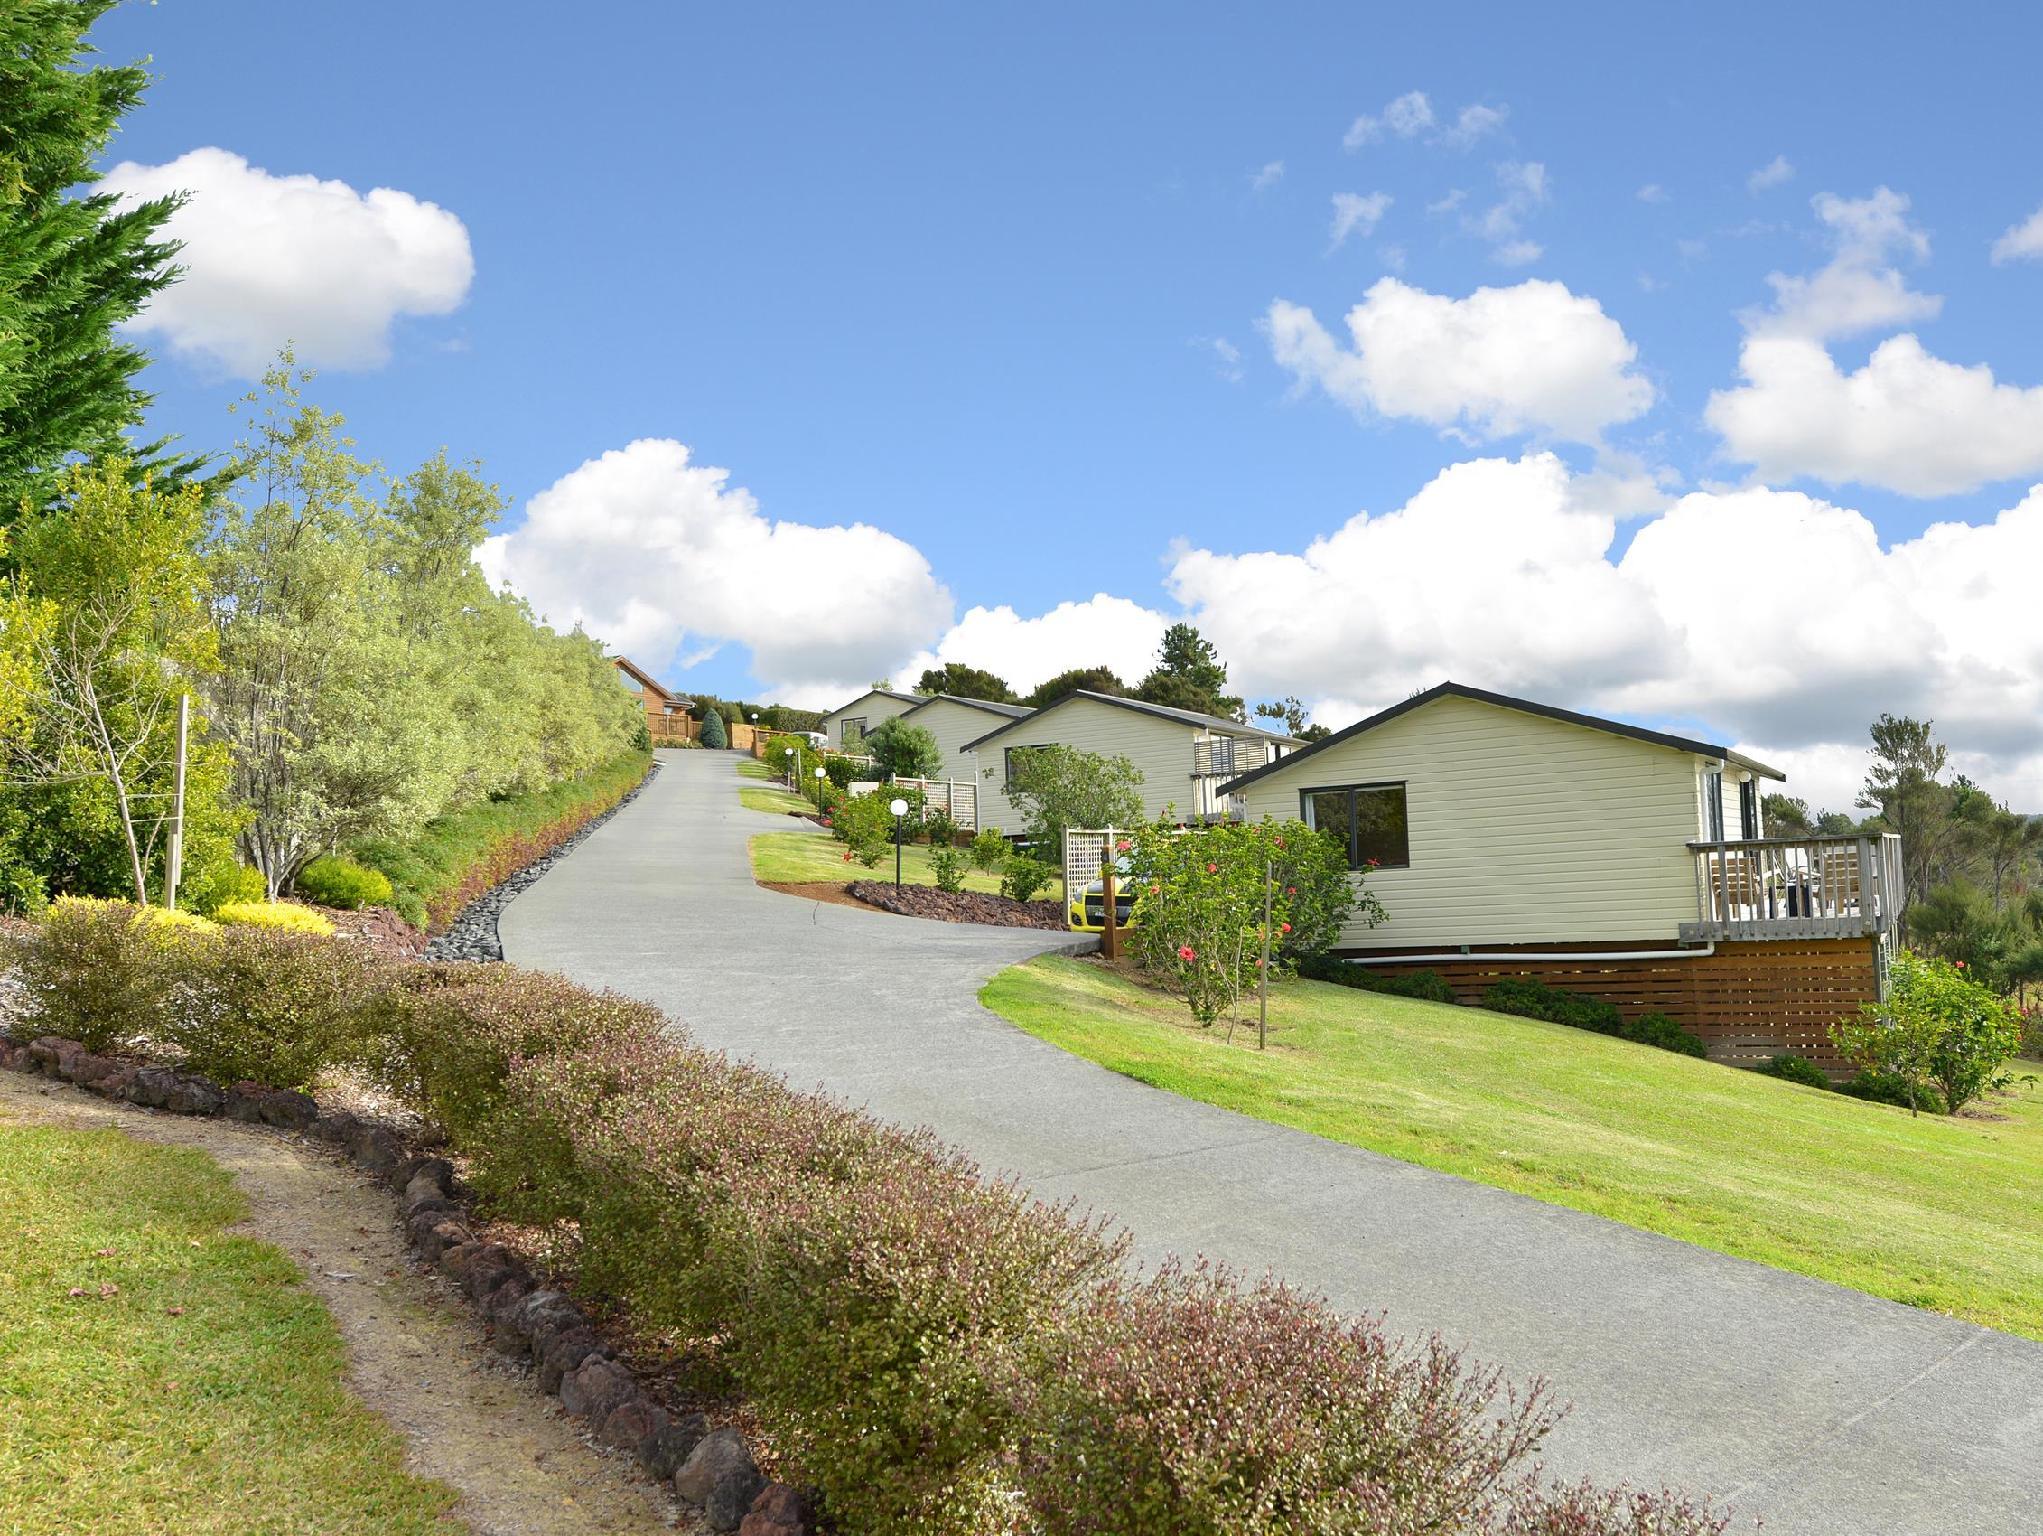 Sunseeker Cottages - Hotell och Boende i Nya Zeeland i Stilla havet och Australien